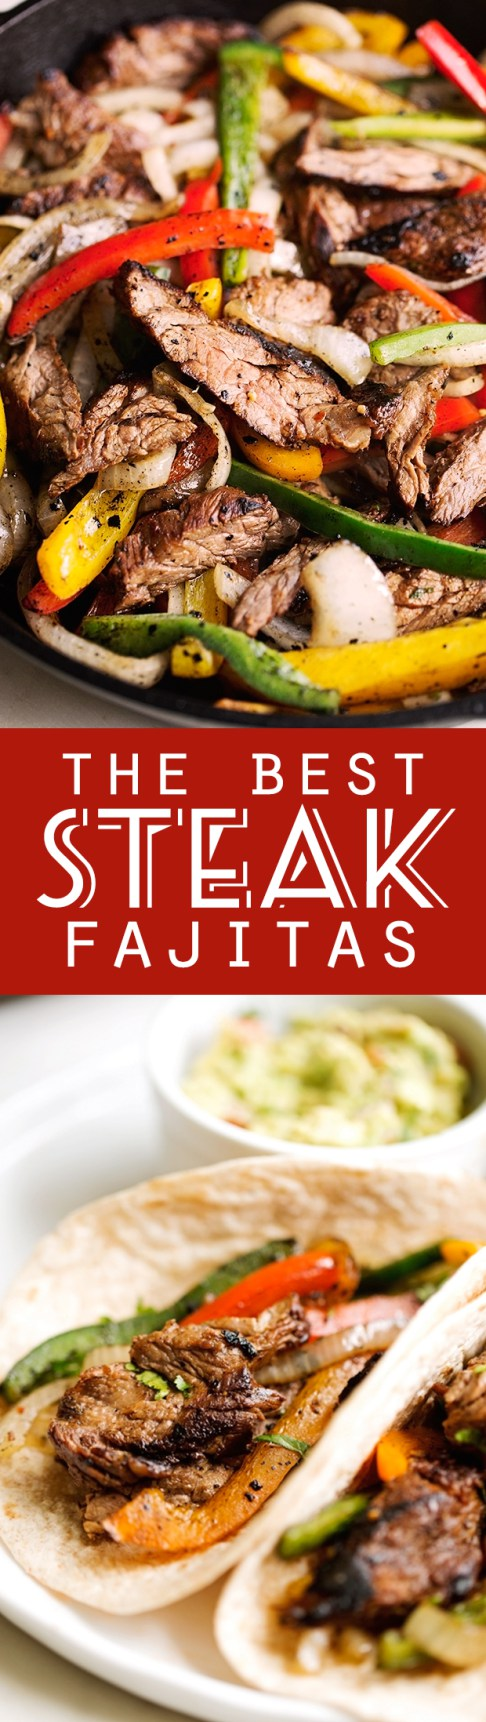 The Very Best Steak Fajitas Recipe Little Spice Jar Recipe Best Steak Fajitas Fajita Recipe Steak Fajita Recipe